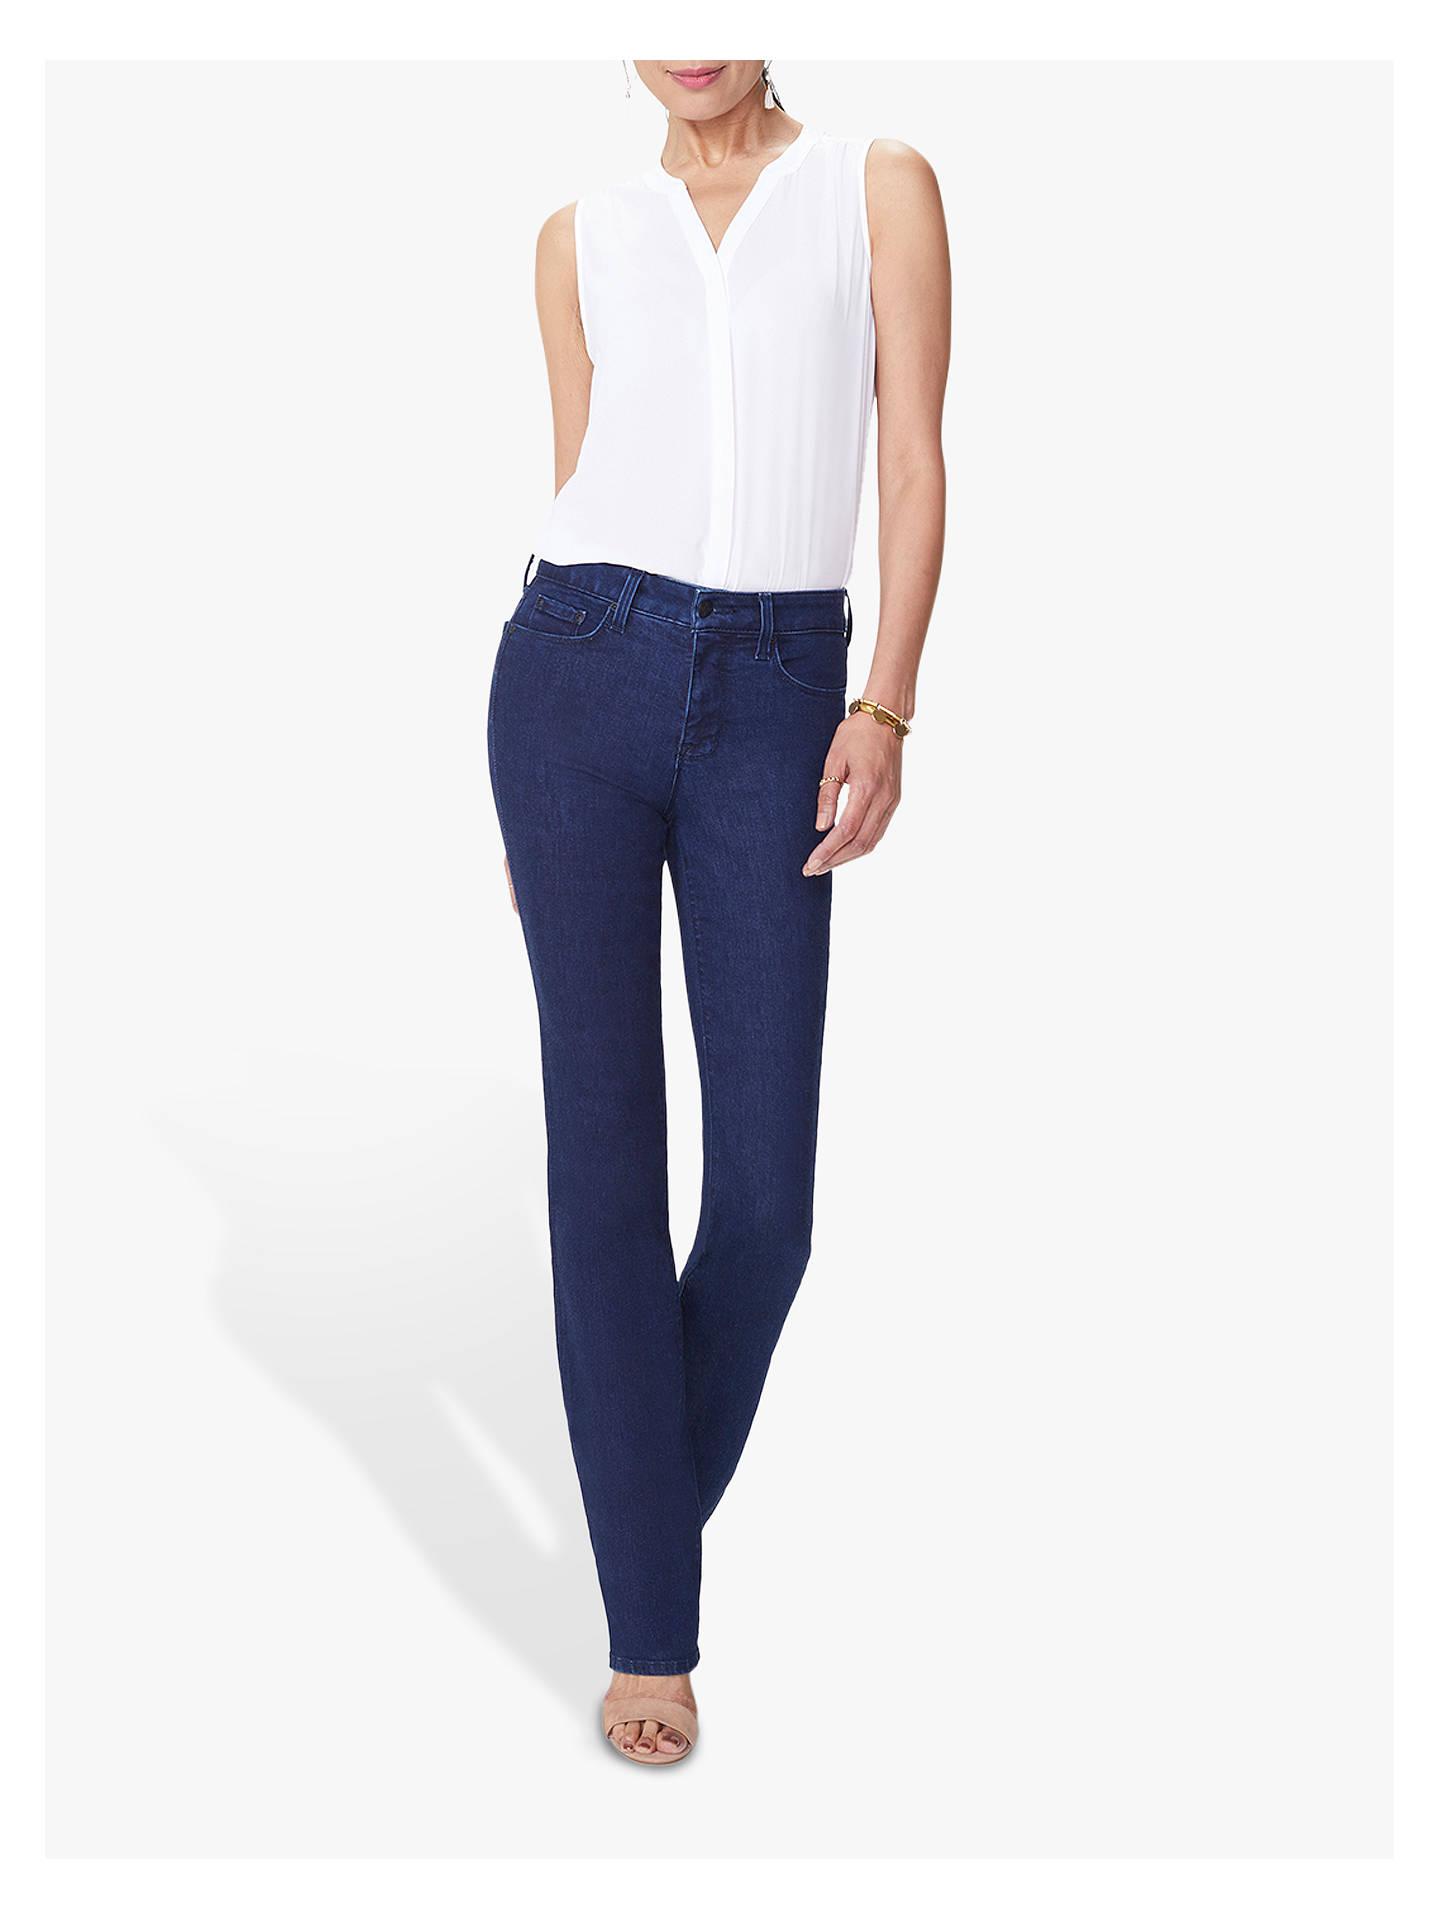 18 NEW 10 NYDJ Women Marilyn Straight Jeans Blue Dark Wash UK 8